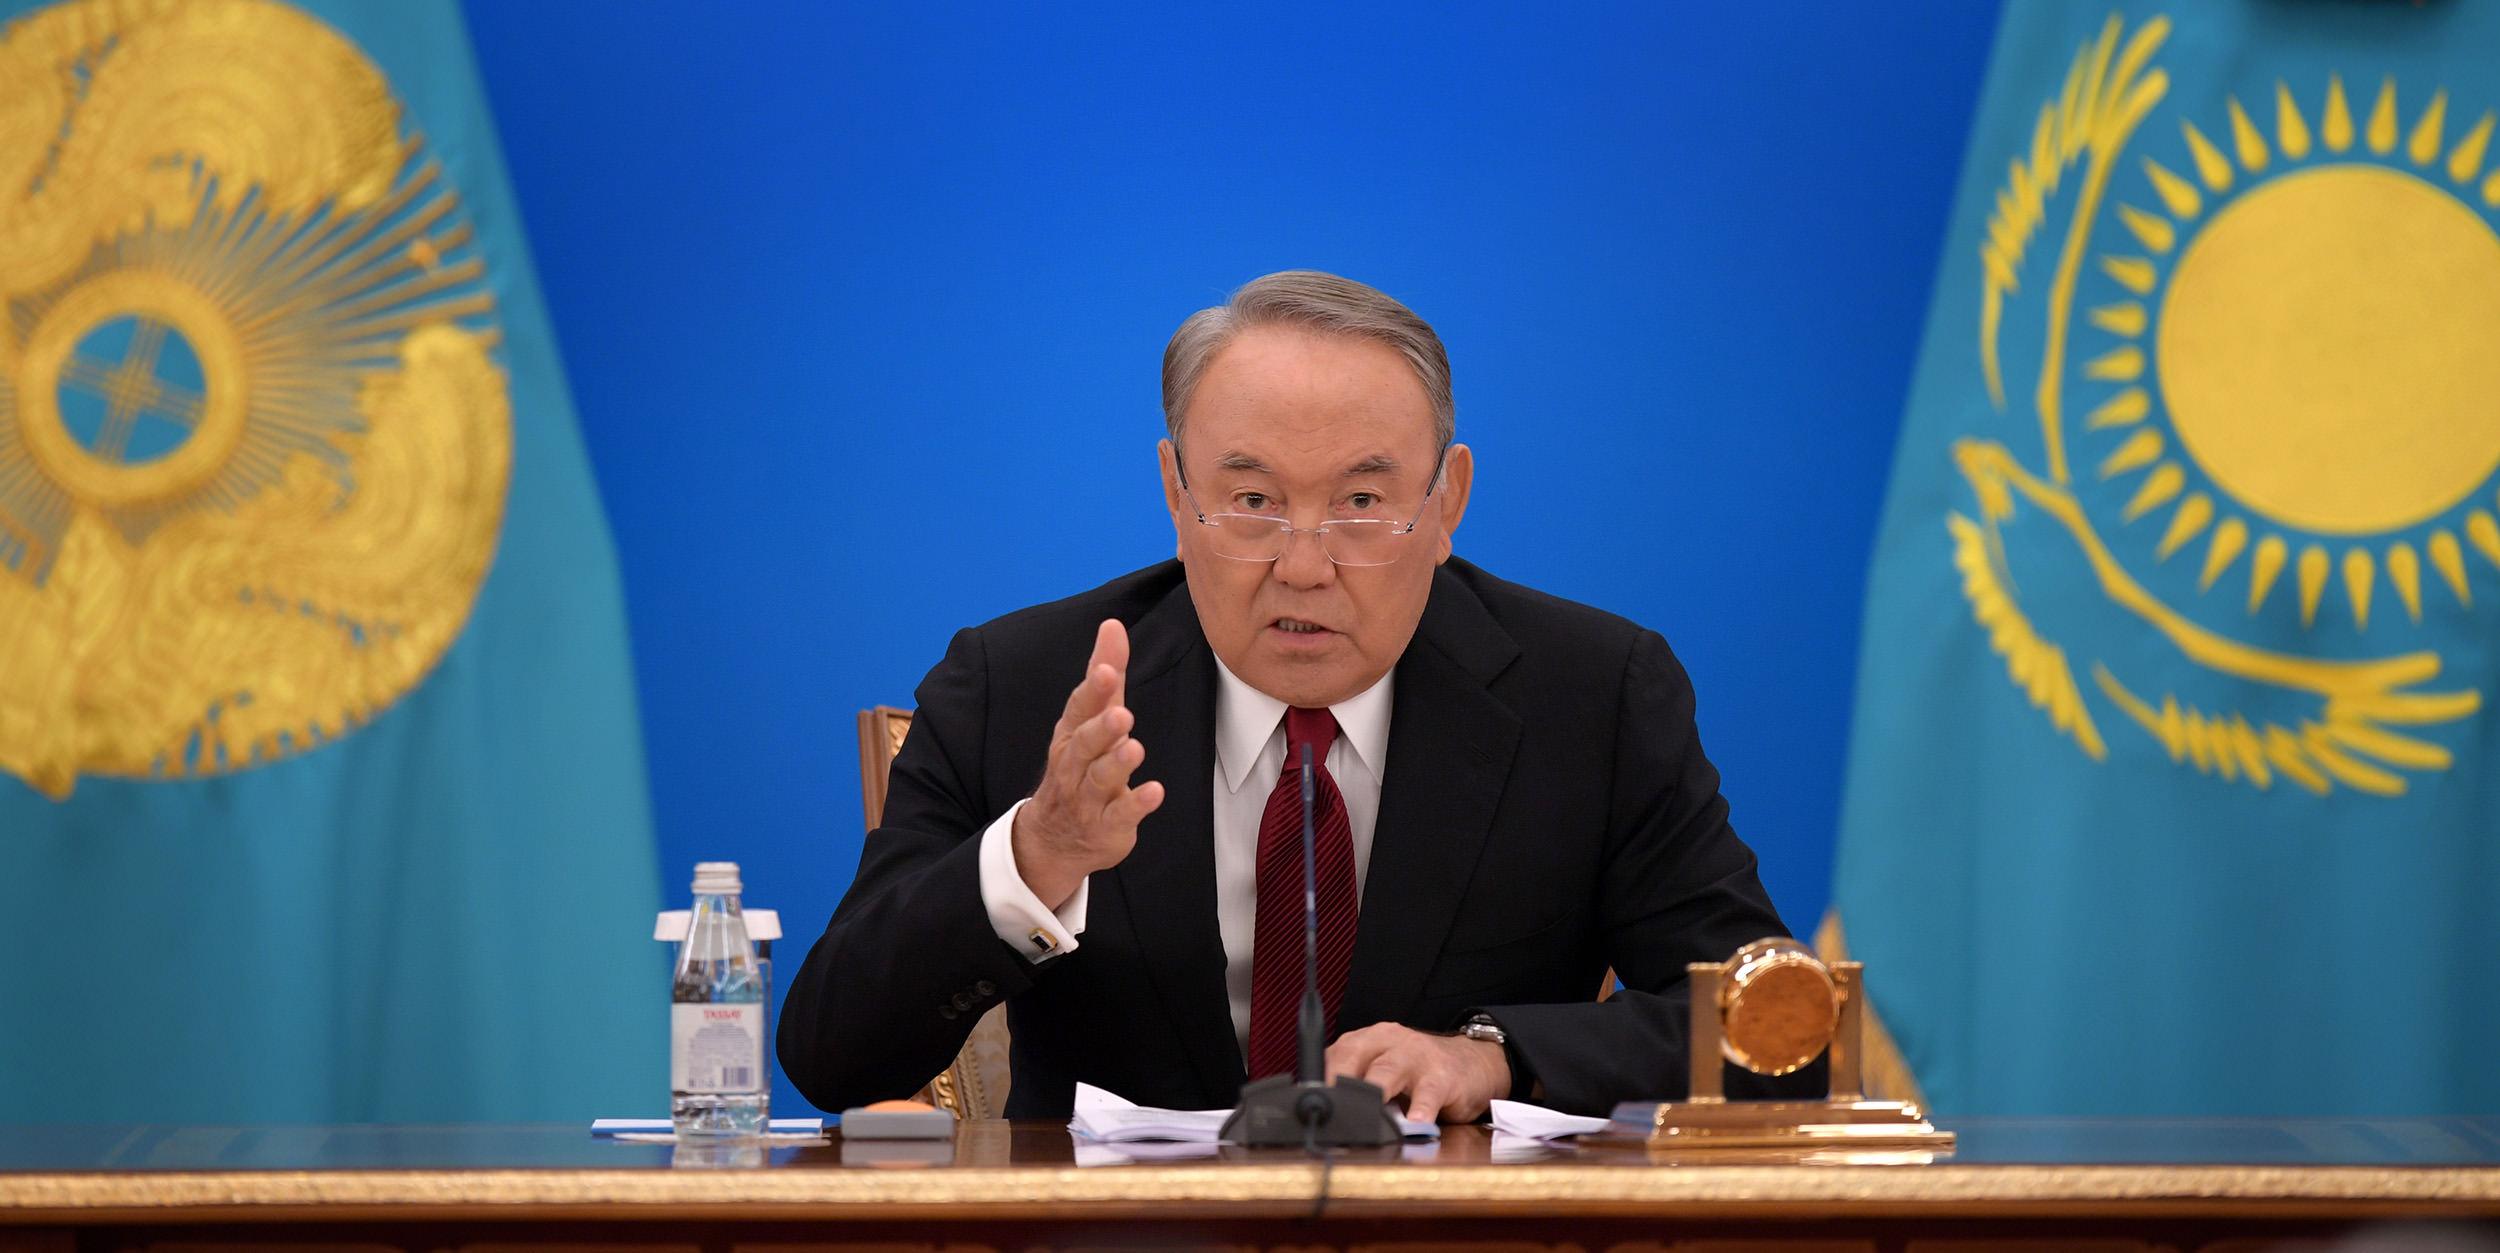 Послание Президента Республики Казахстан Н.Назарбаева народу Казахстана. 5 октября 2018 г.